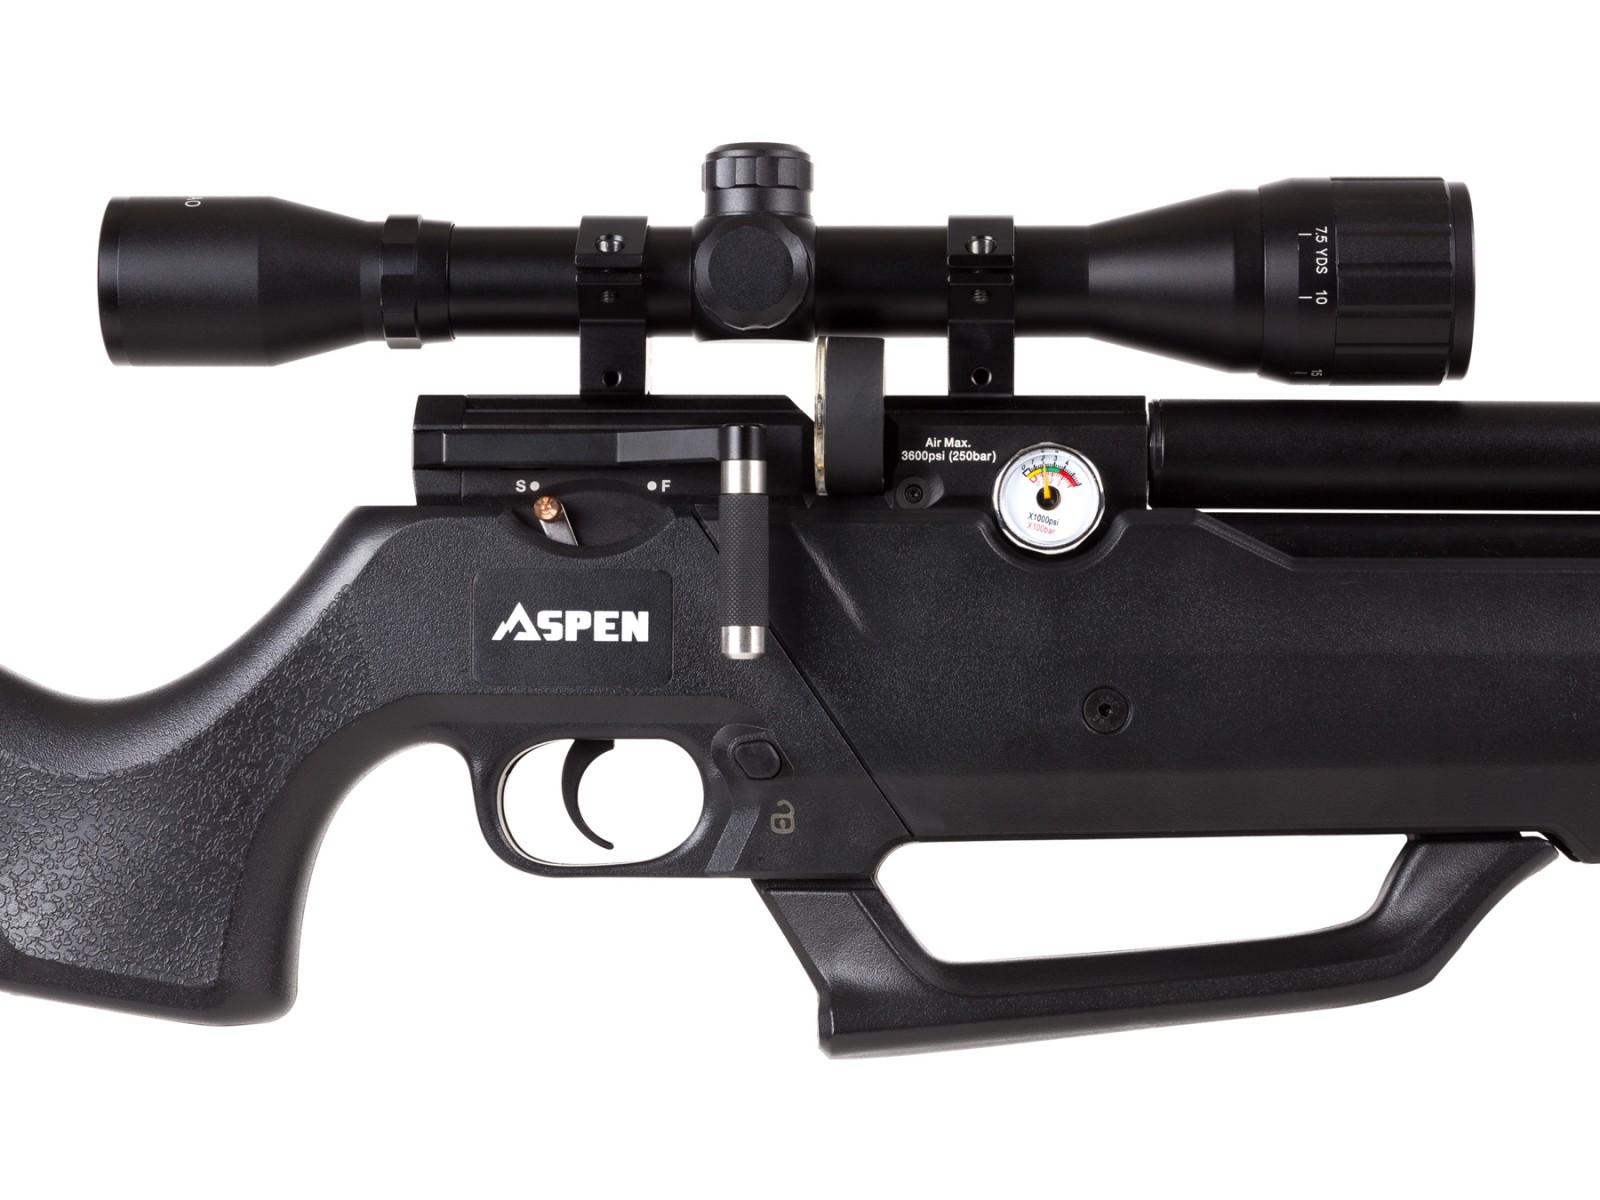 Details about Seneca Aspen PCP Air Rifle - 0 22 cal Seneca Aspen Air Rifle